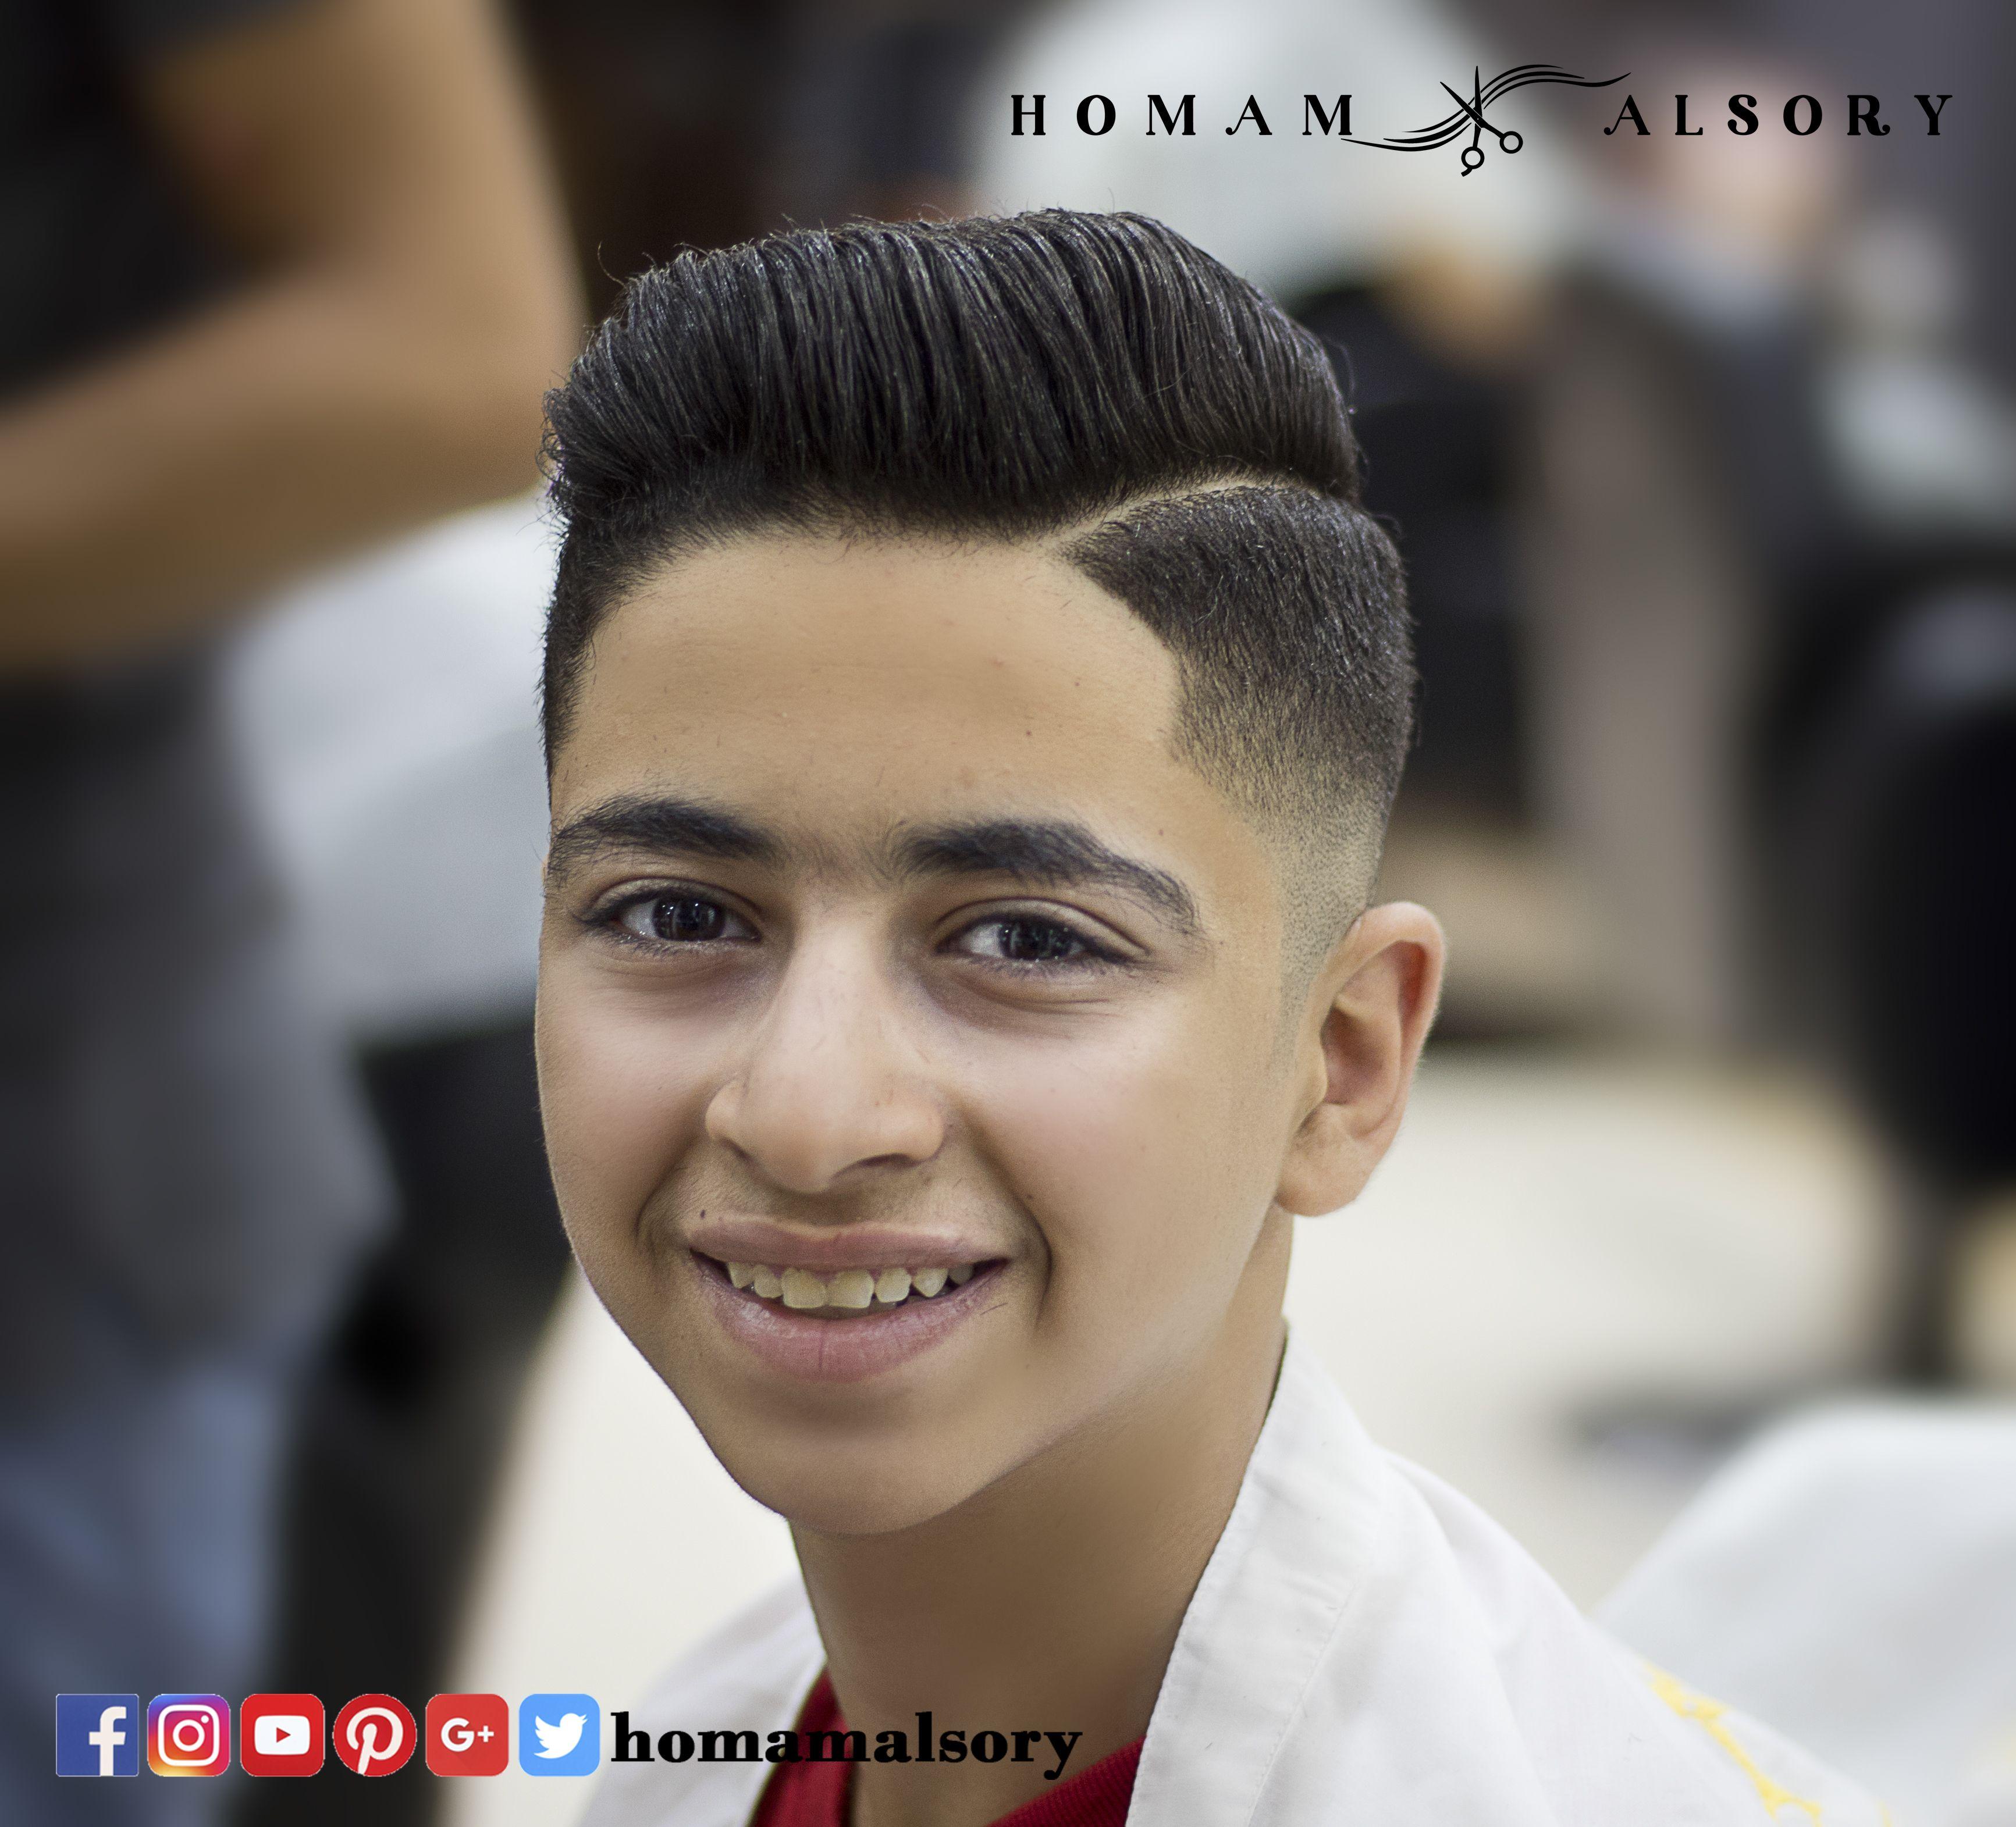 Homam Alsory Salon Prevention Facebook Sign Up Security